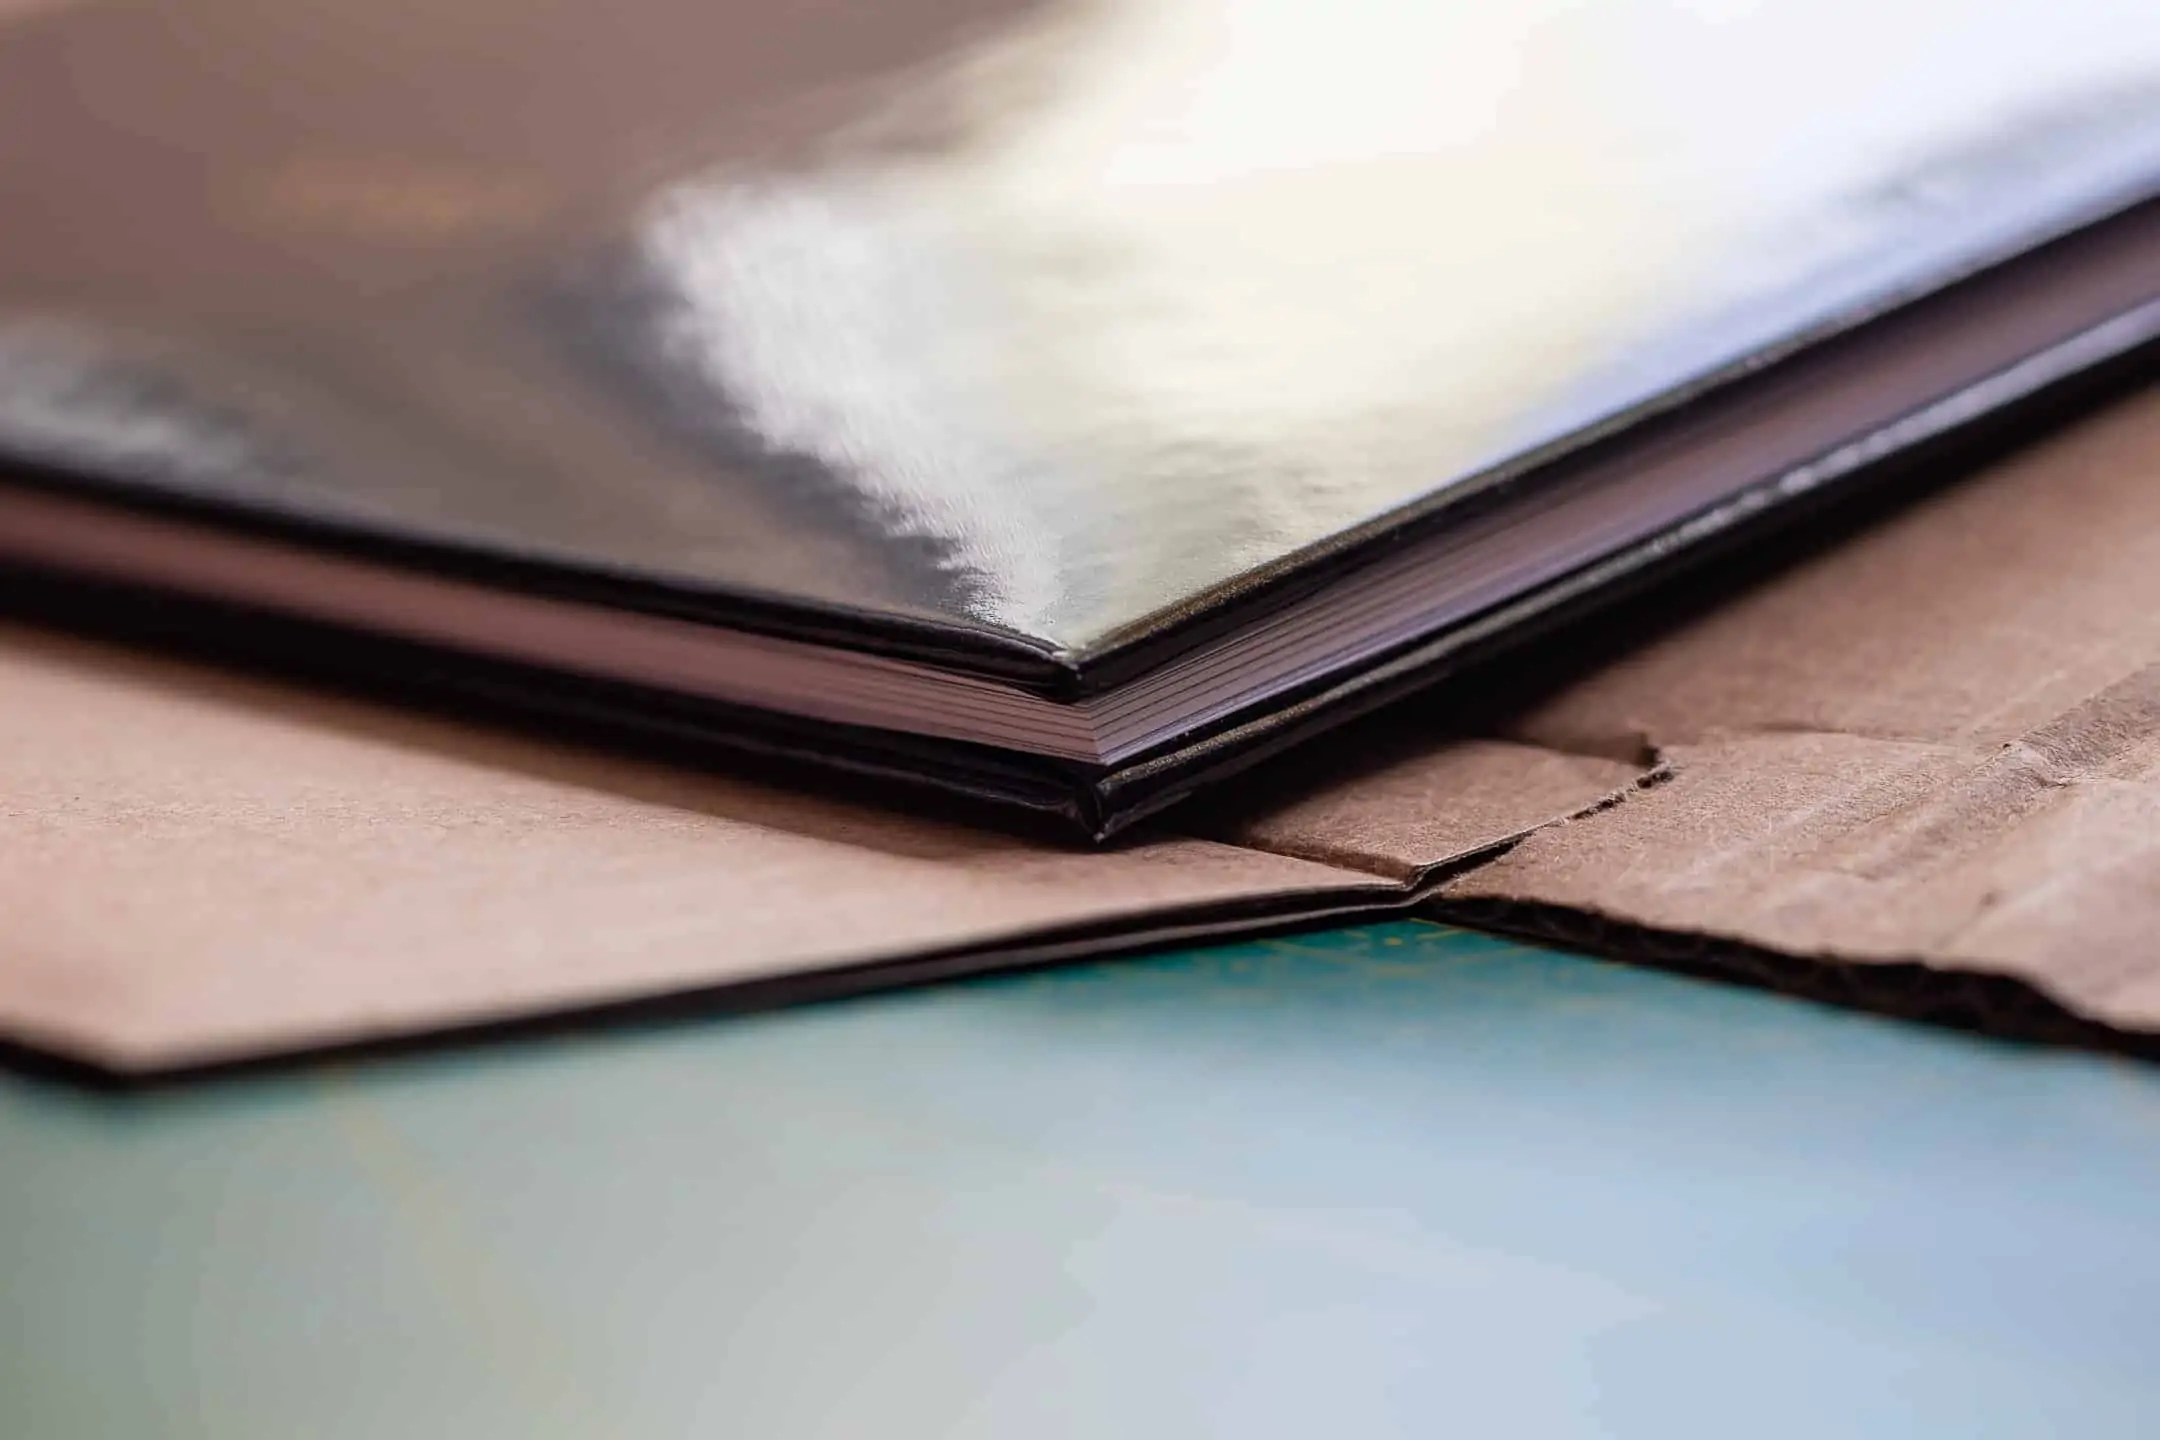 Saal design vs pixbook porównanie książek fotograficznych 3 - Saal design, pixbook - książki fotograficzne